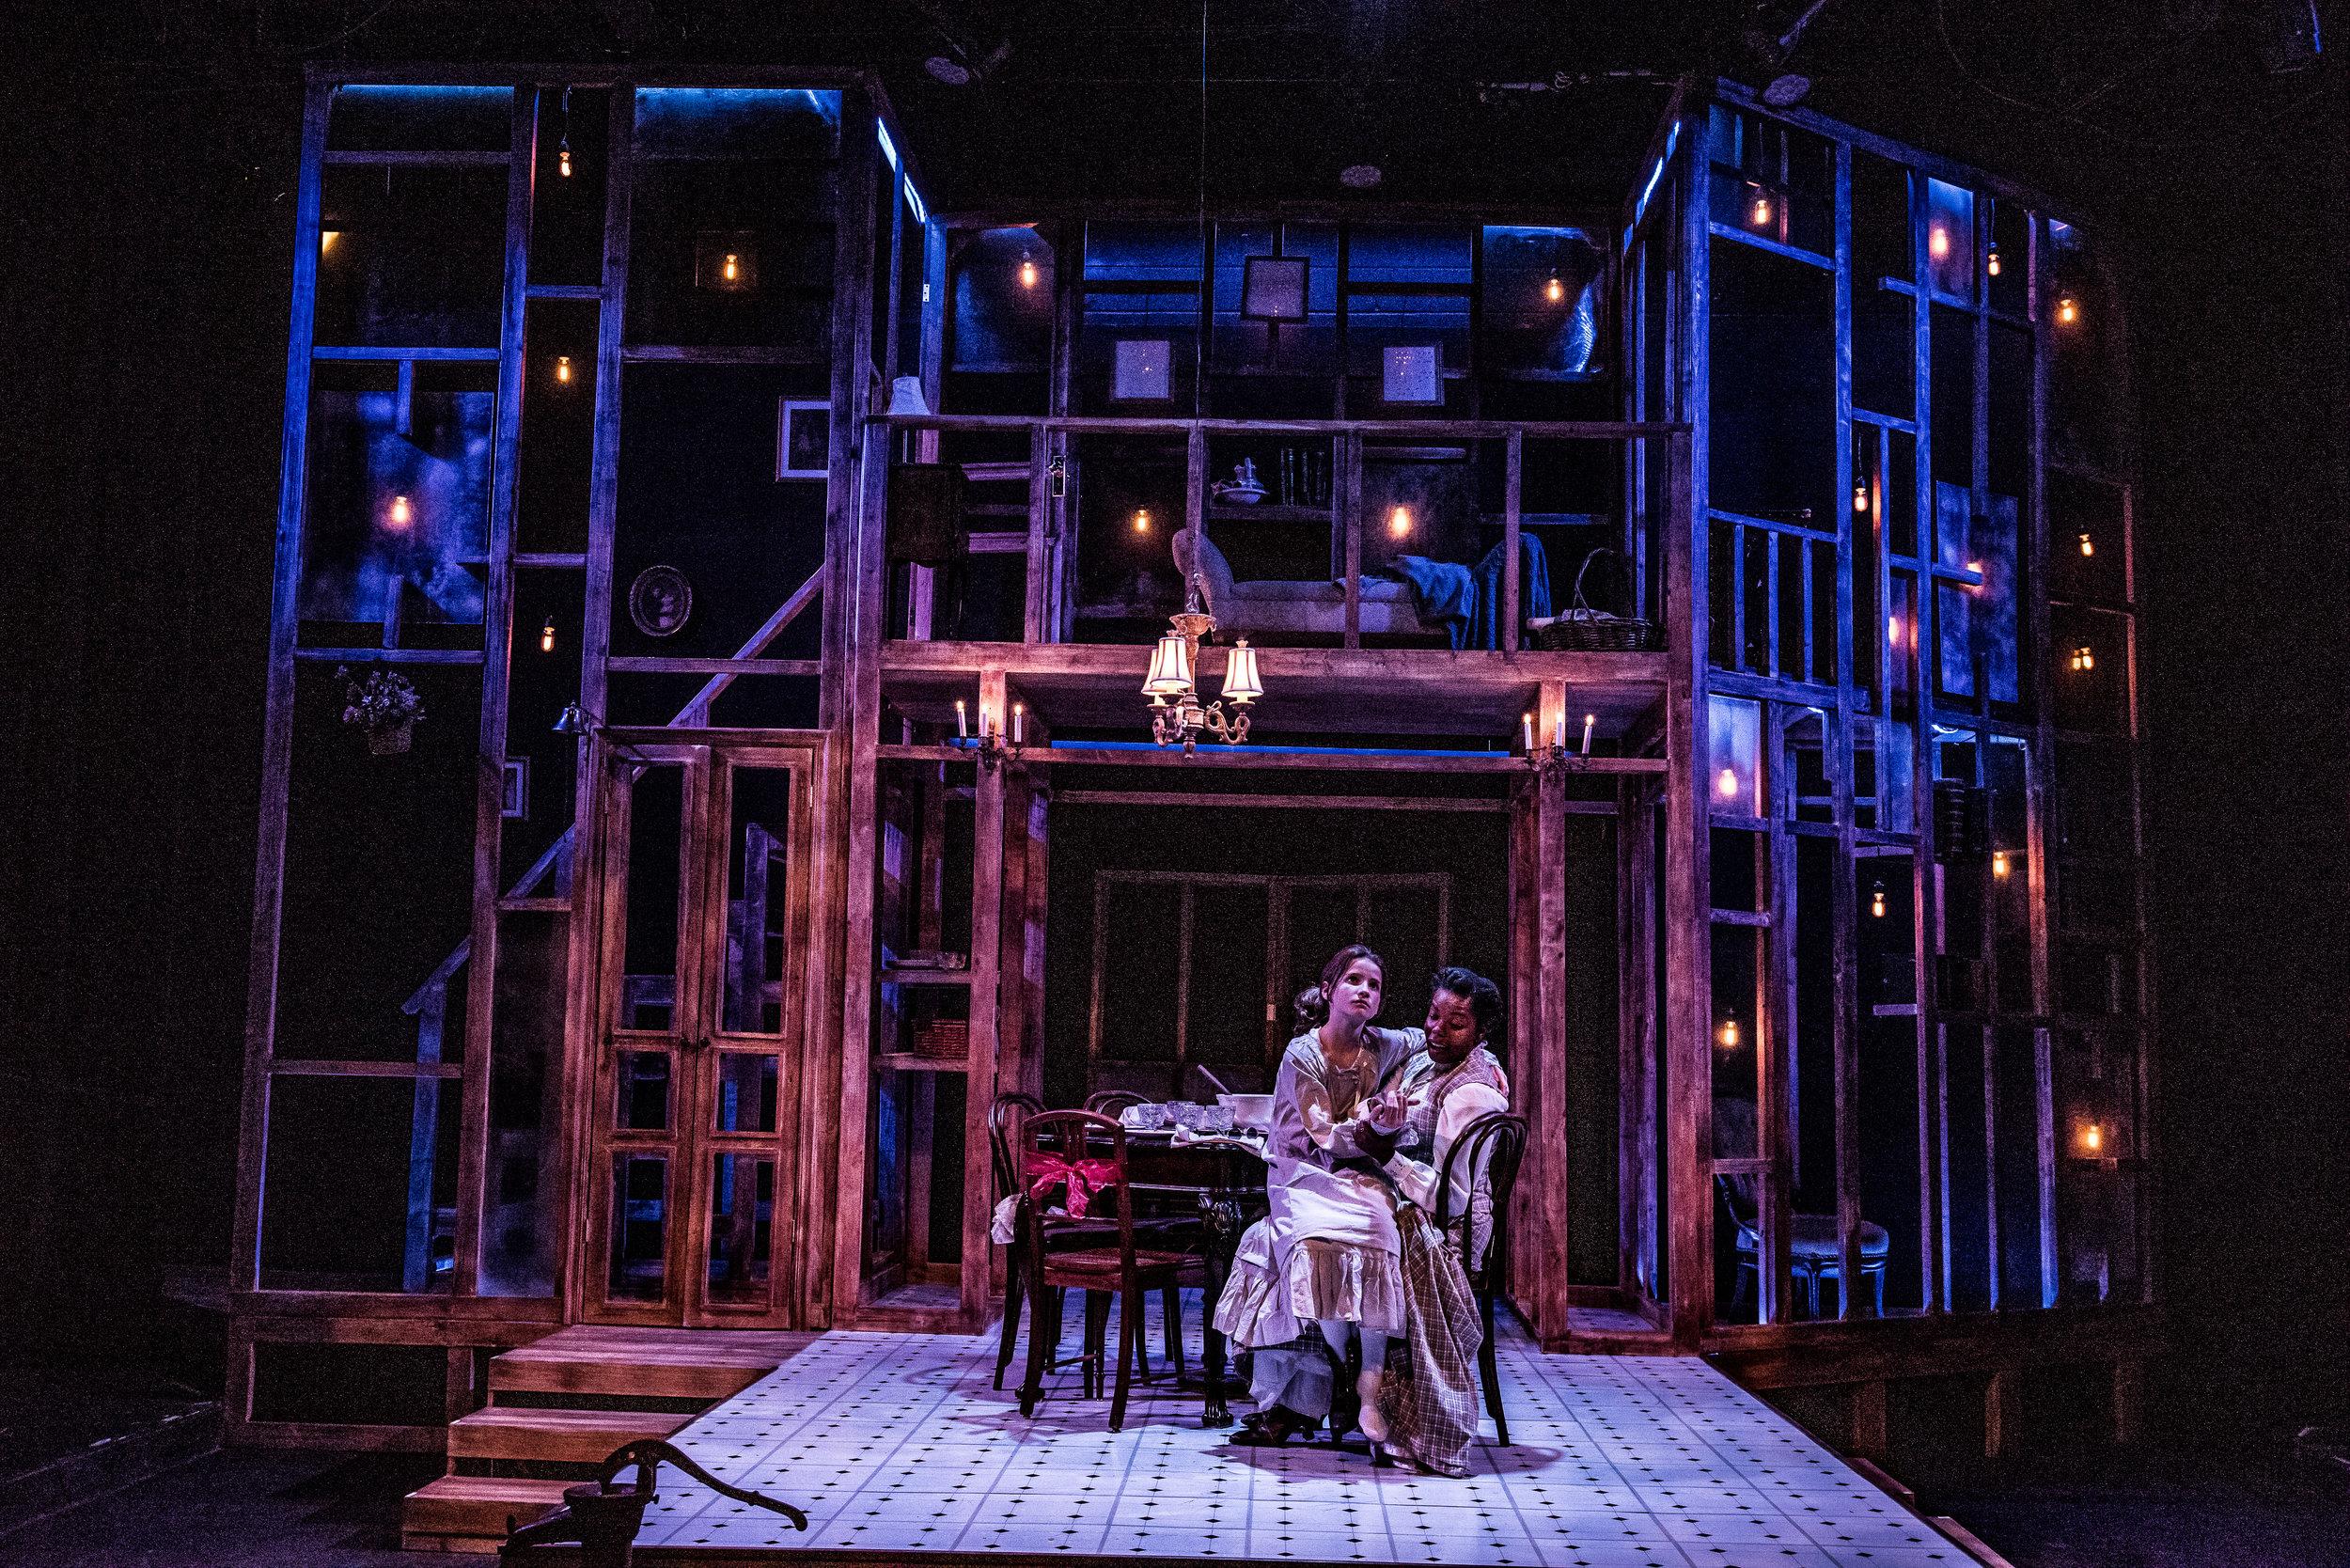 630-Yellow Tree Theatre-Miracle Worker-Helen Keller-Osseo-Minneapolis-community-photography-September 11, 2018-www.jcoxphotography.com.jpg